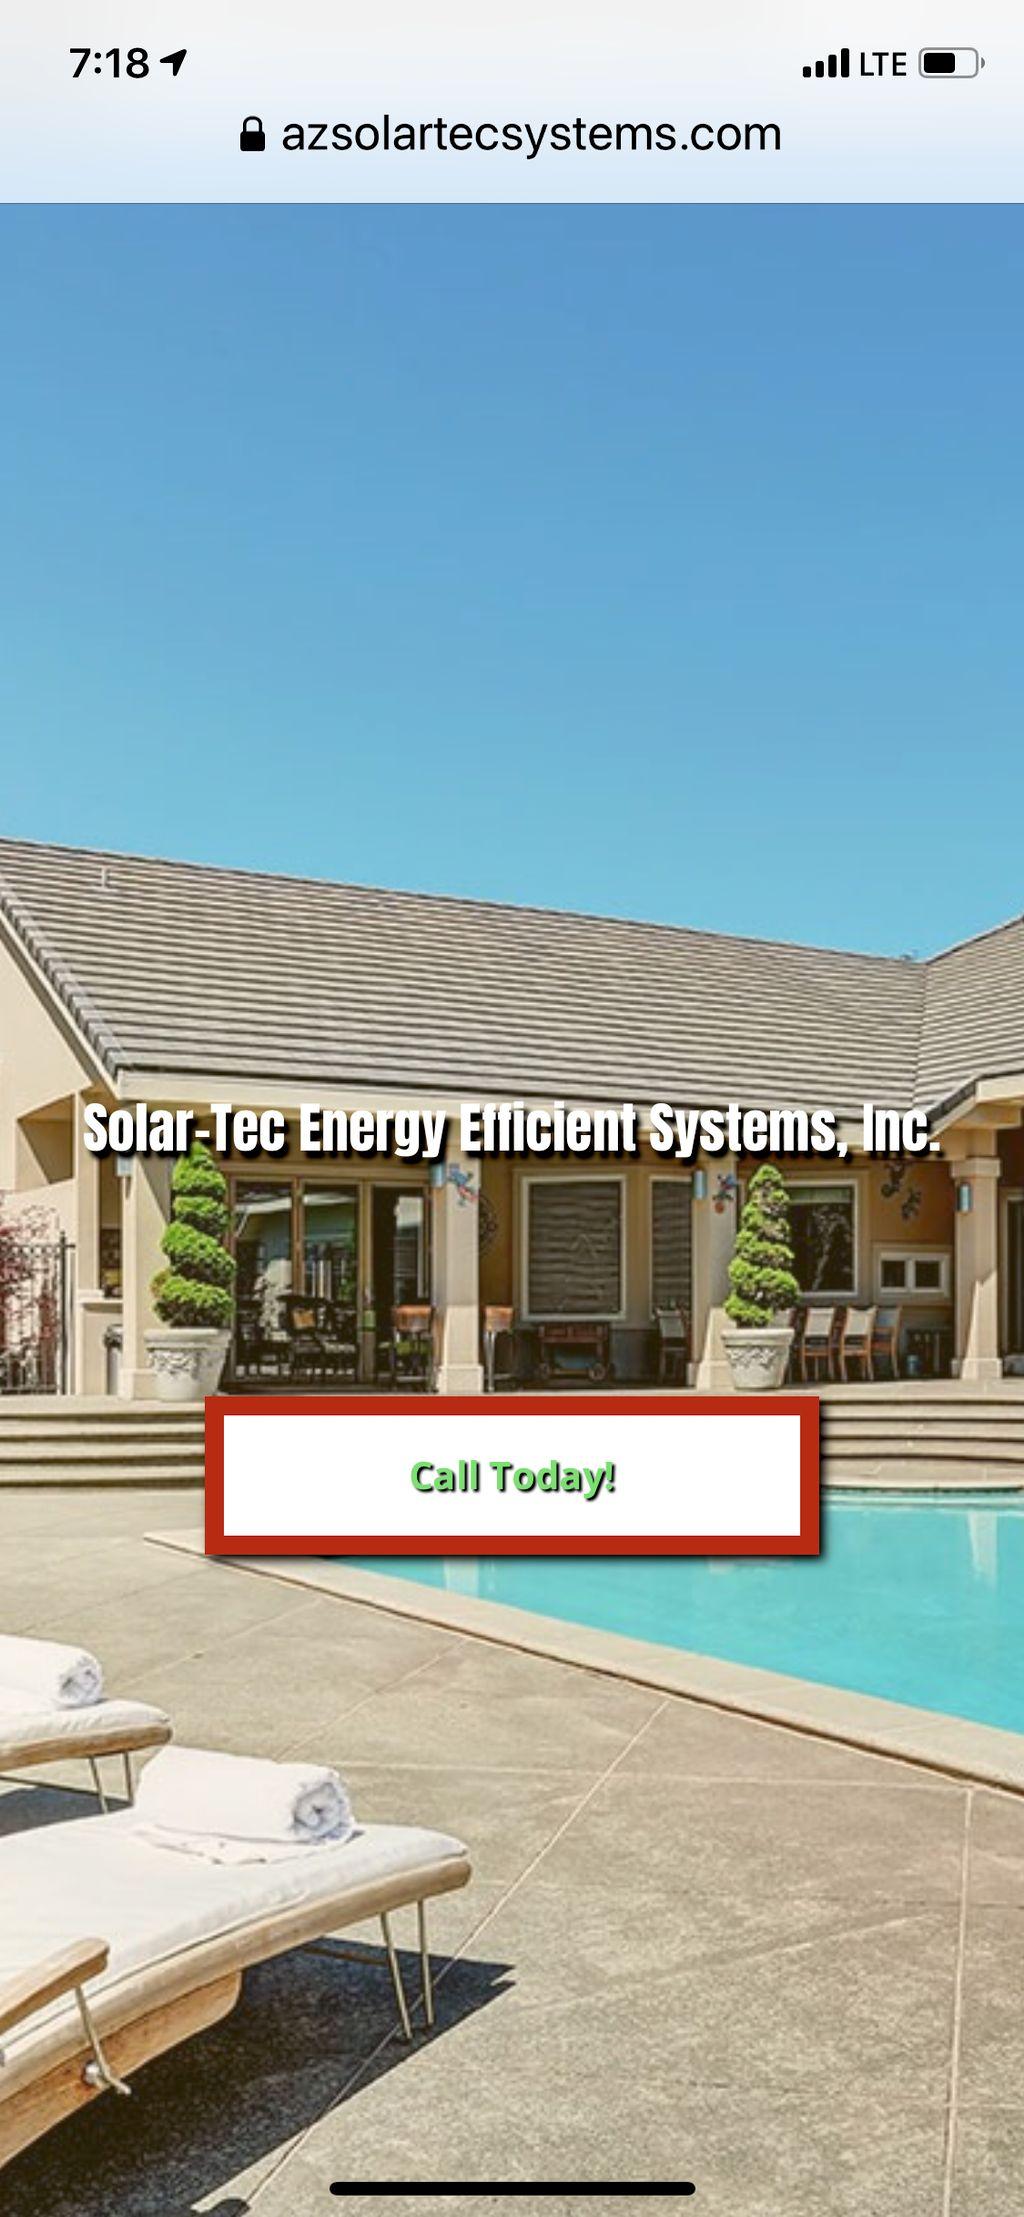 SOLAR TEC 'Energy Efficient Systems'